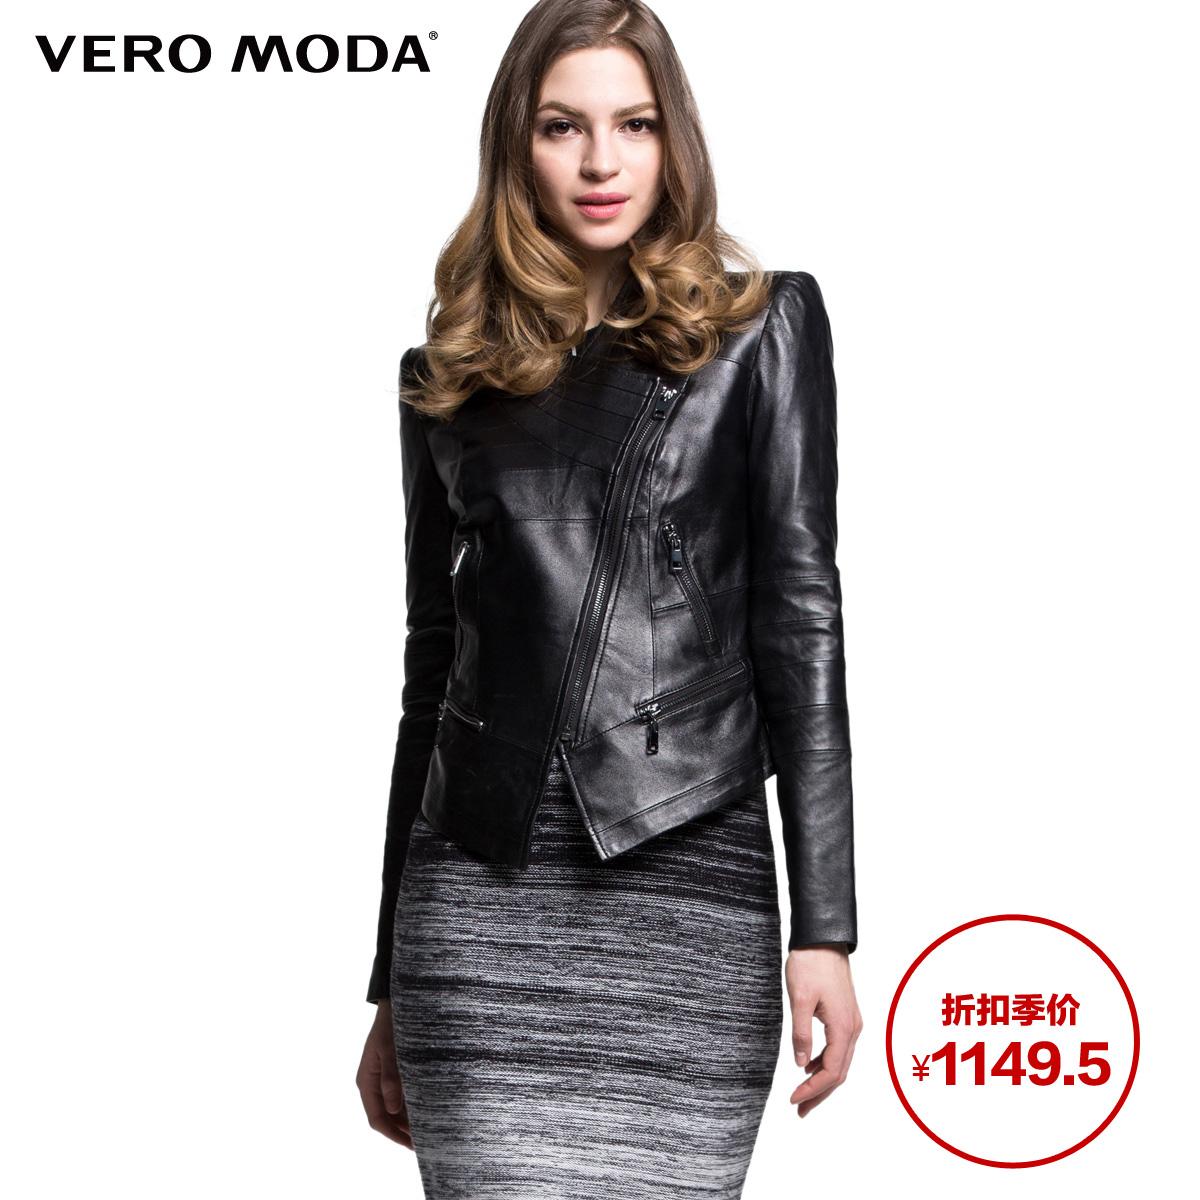 Кожаная куртка VERO MODA 315110021 1149.5 !VeroModa куртка vero moda 10191226 black